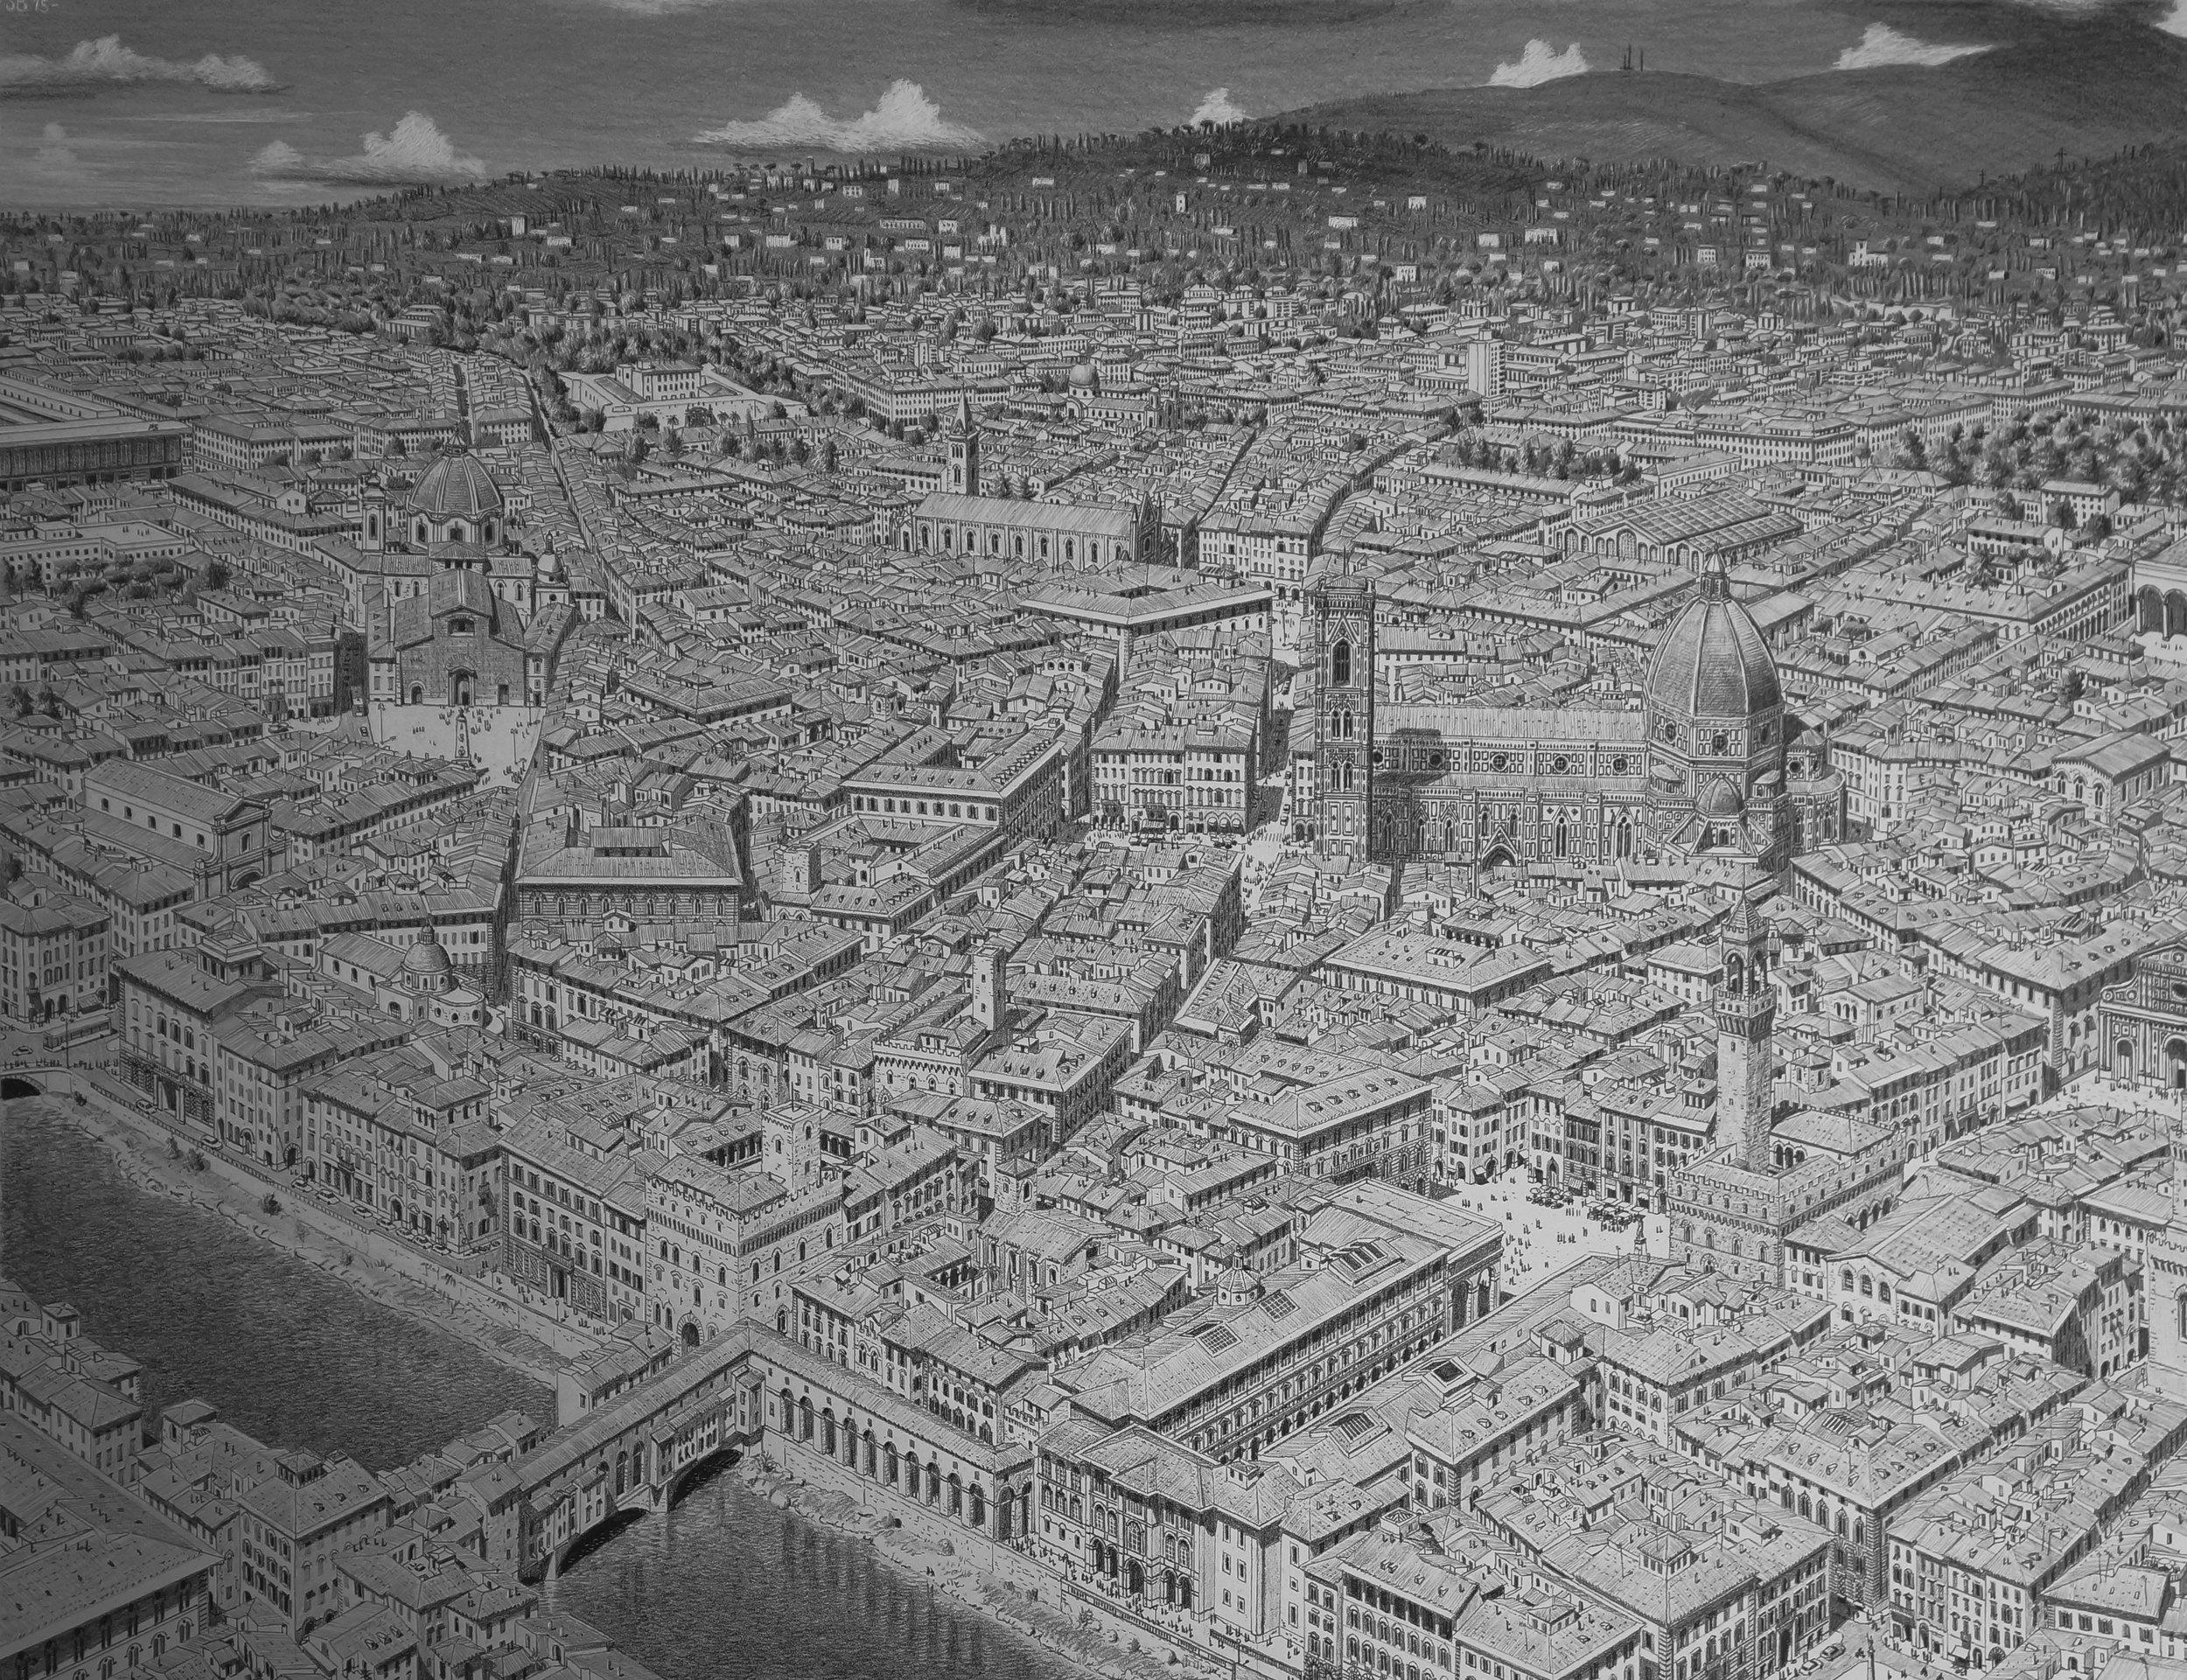 Capriccio City by the Tiber, 2015